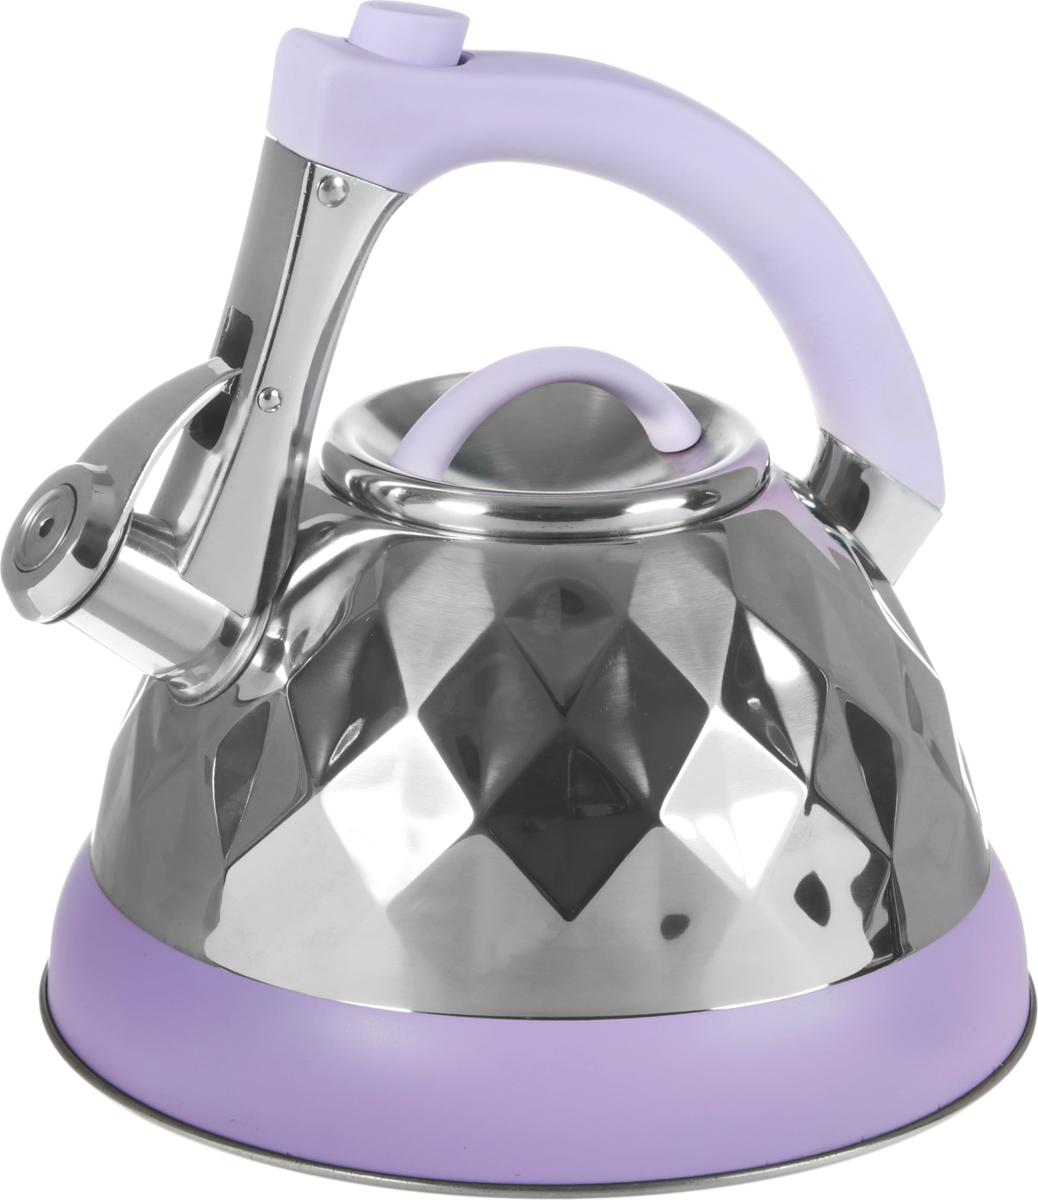 Чайник Bohmann, со свистком, цвет: сиреневый, 3,5 л. BH-8087 чайник bohmann 9959 bh